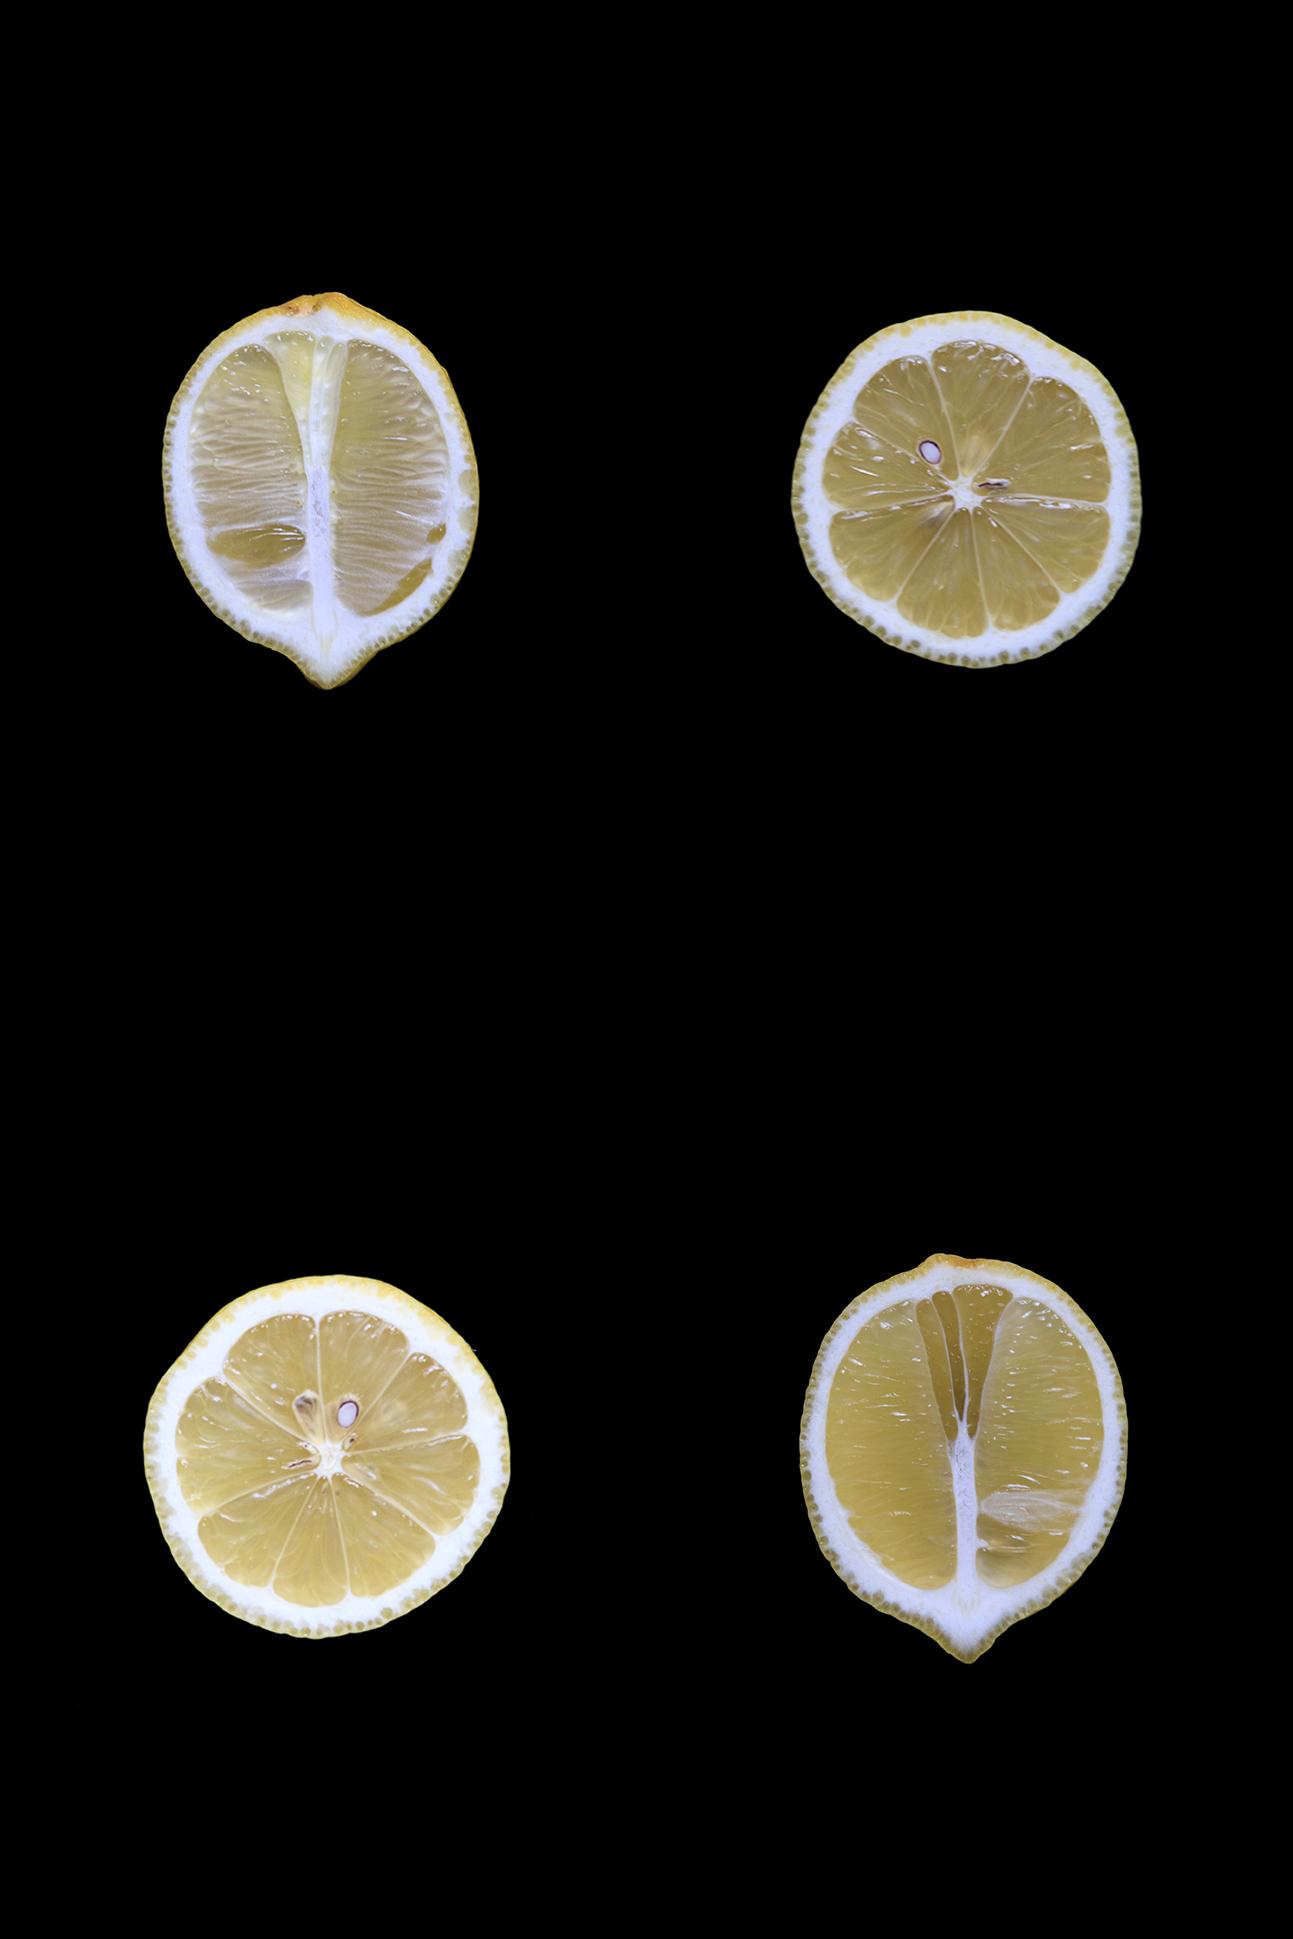 Lemon, Day One